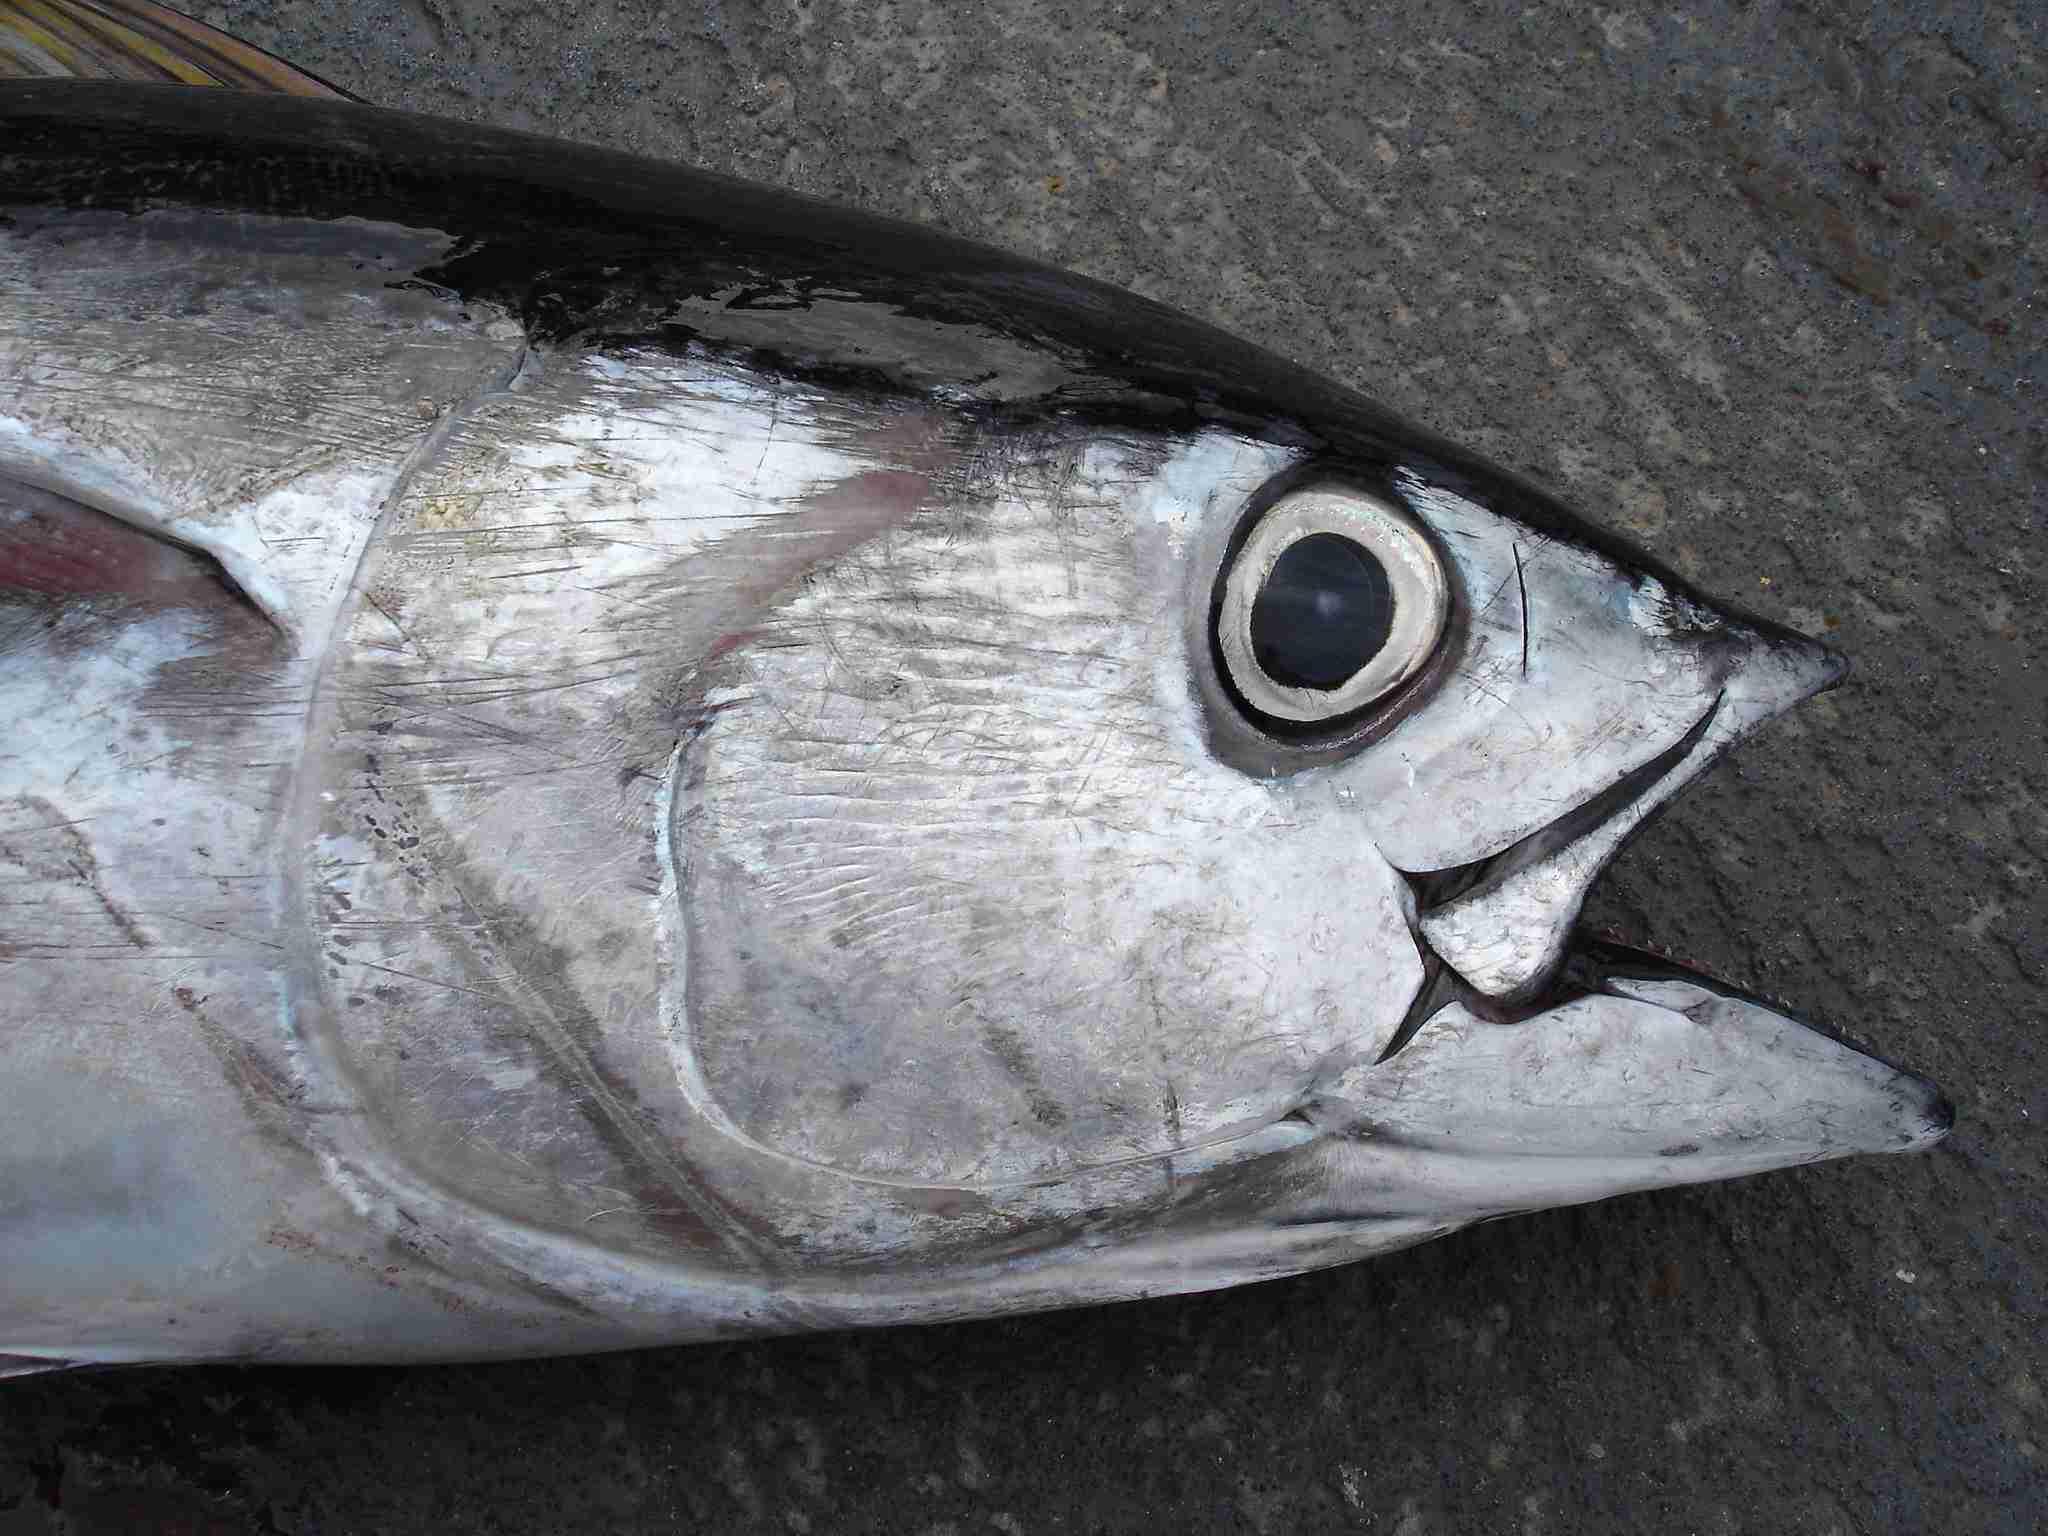 Bigeye tuna close up